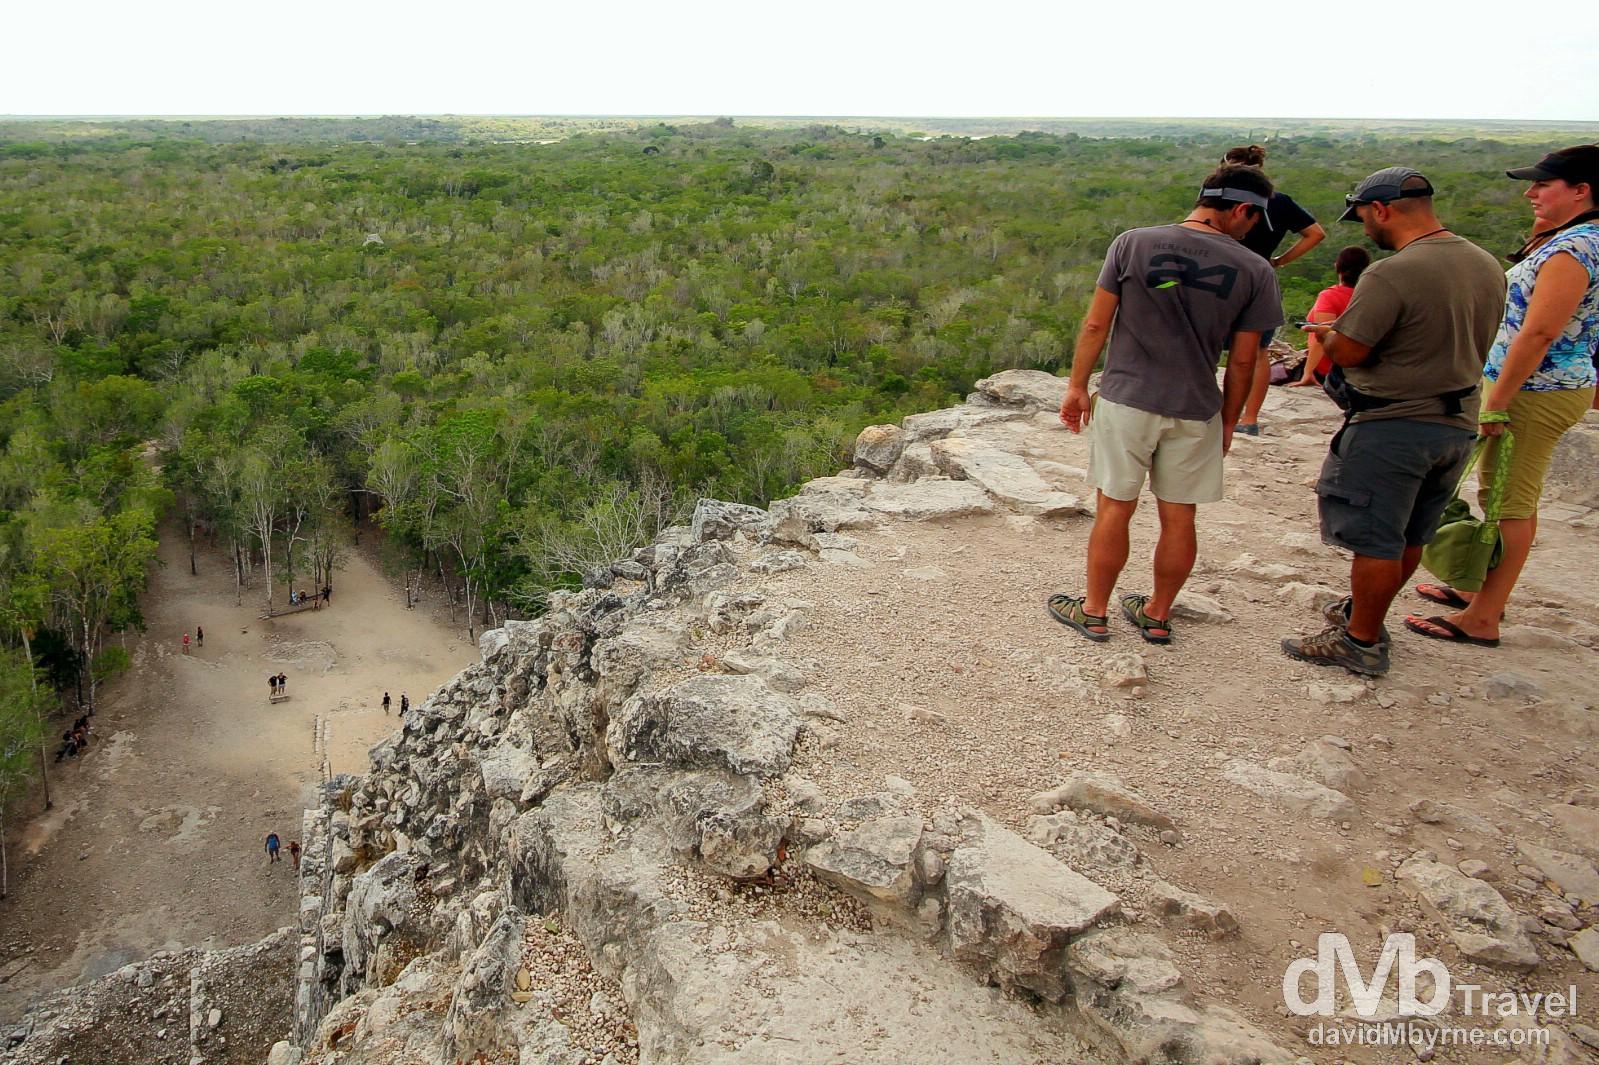 The view of the surrounding jungle from atop the Nohoch Mul (Big Mound), or Great Pyramid, at the Coba Mayan ruins, Yucatan Peninsula, Mexico. May 7th 2013.